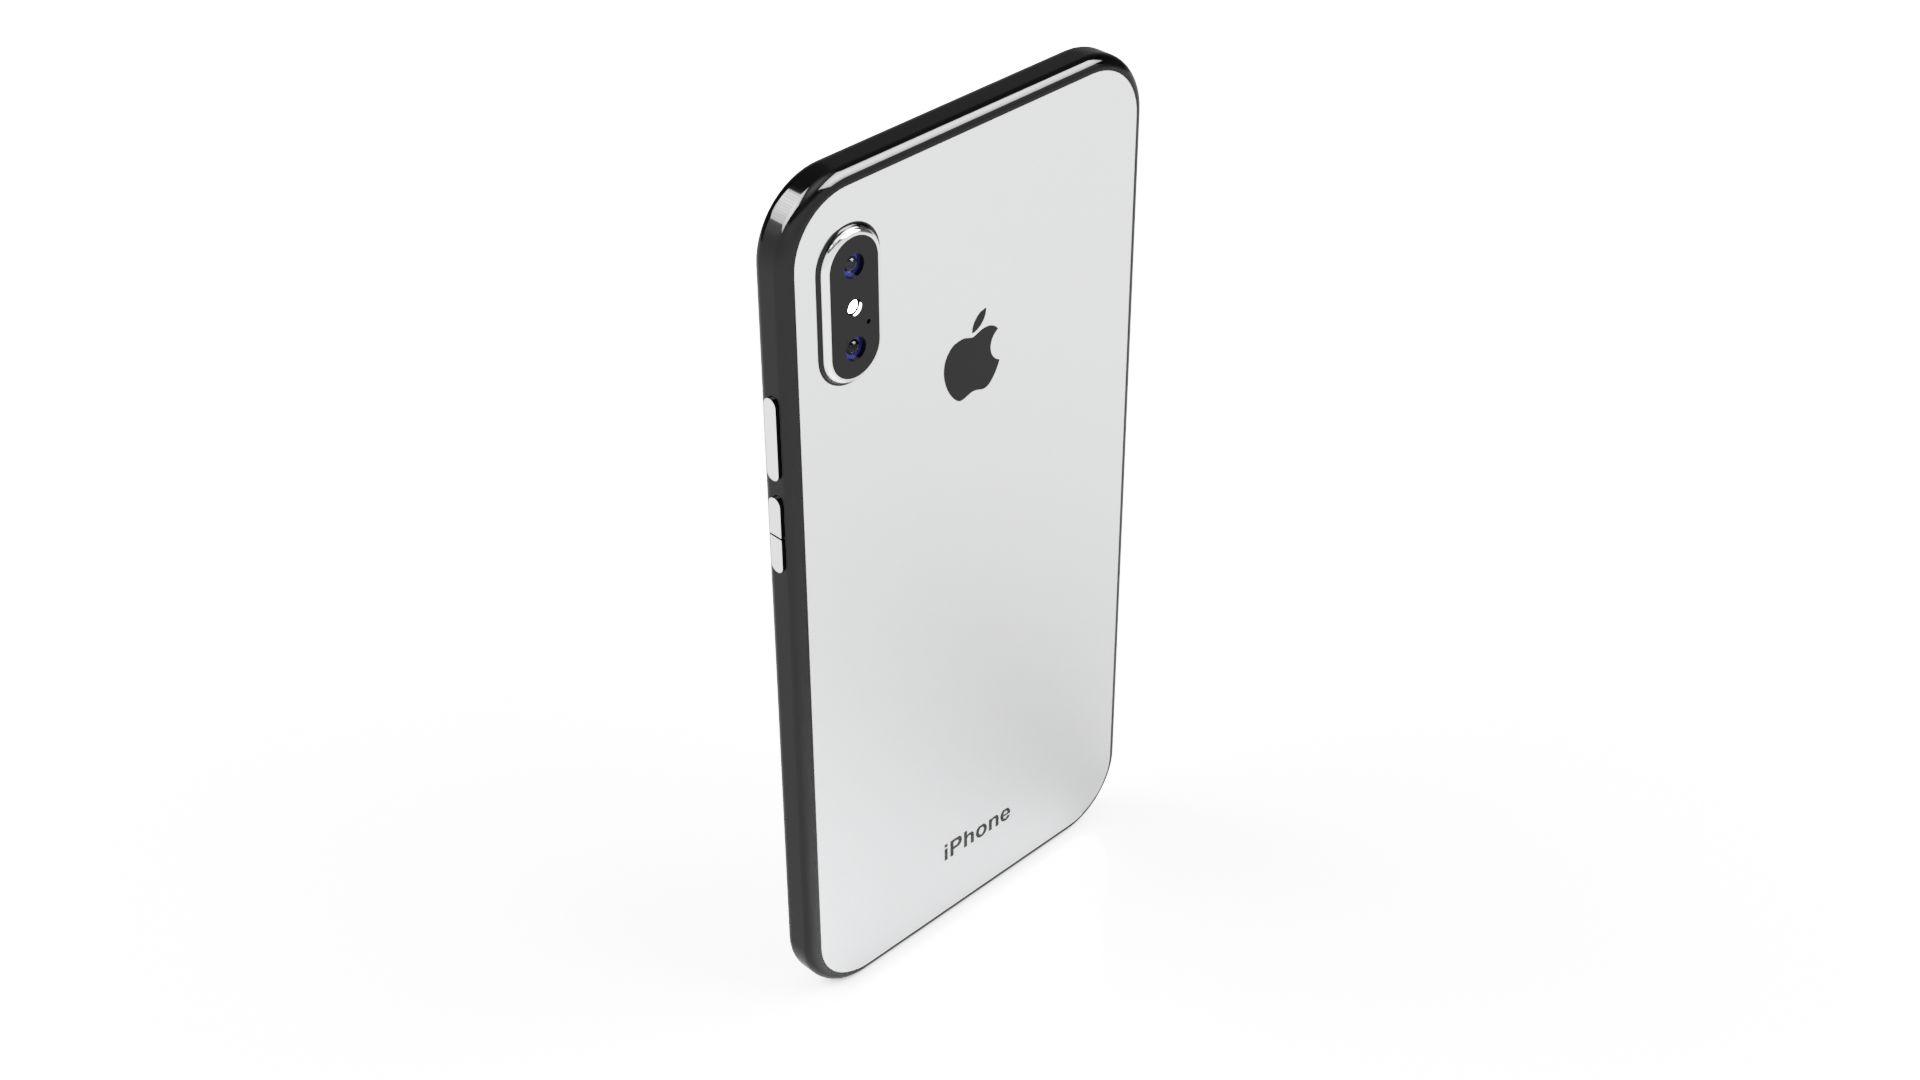 Iphone-3-3500-3500